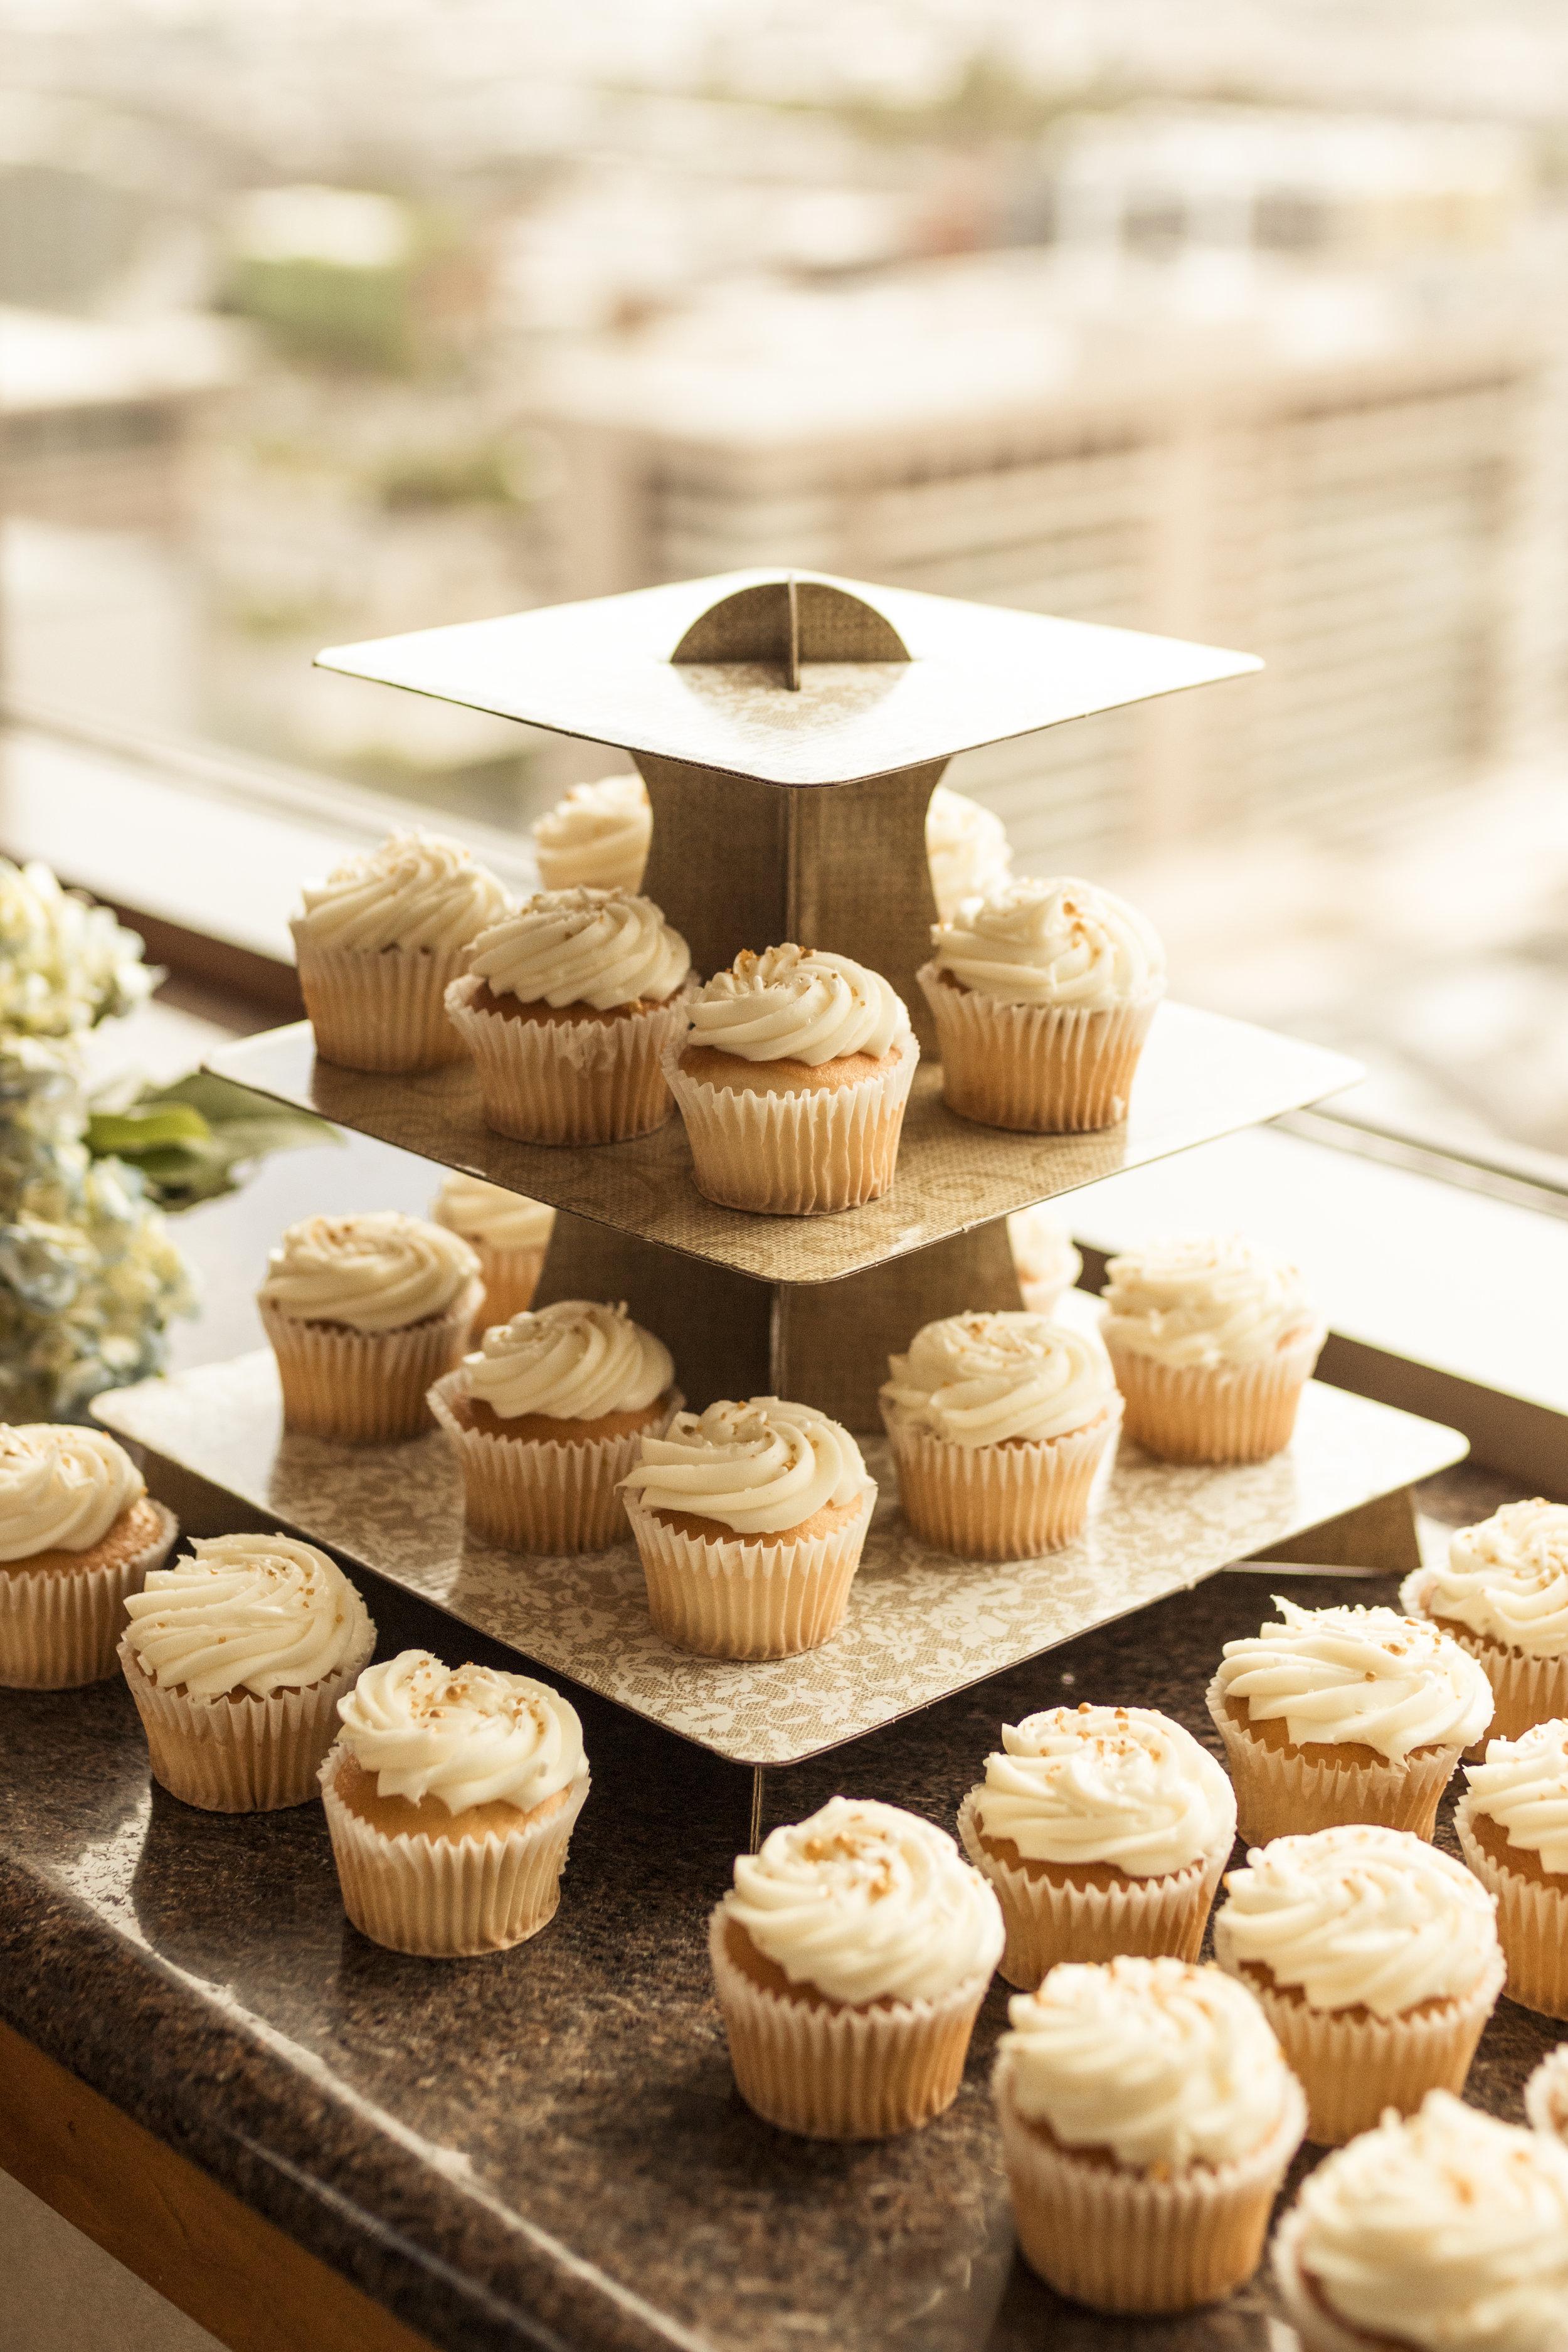 Utah Spring Wedding Reception in the Zions Bank Founders Room by Bri Bergman Photography02.JPG